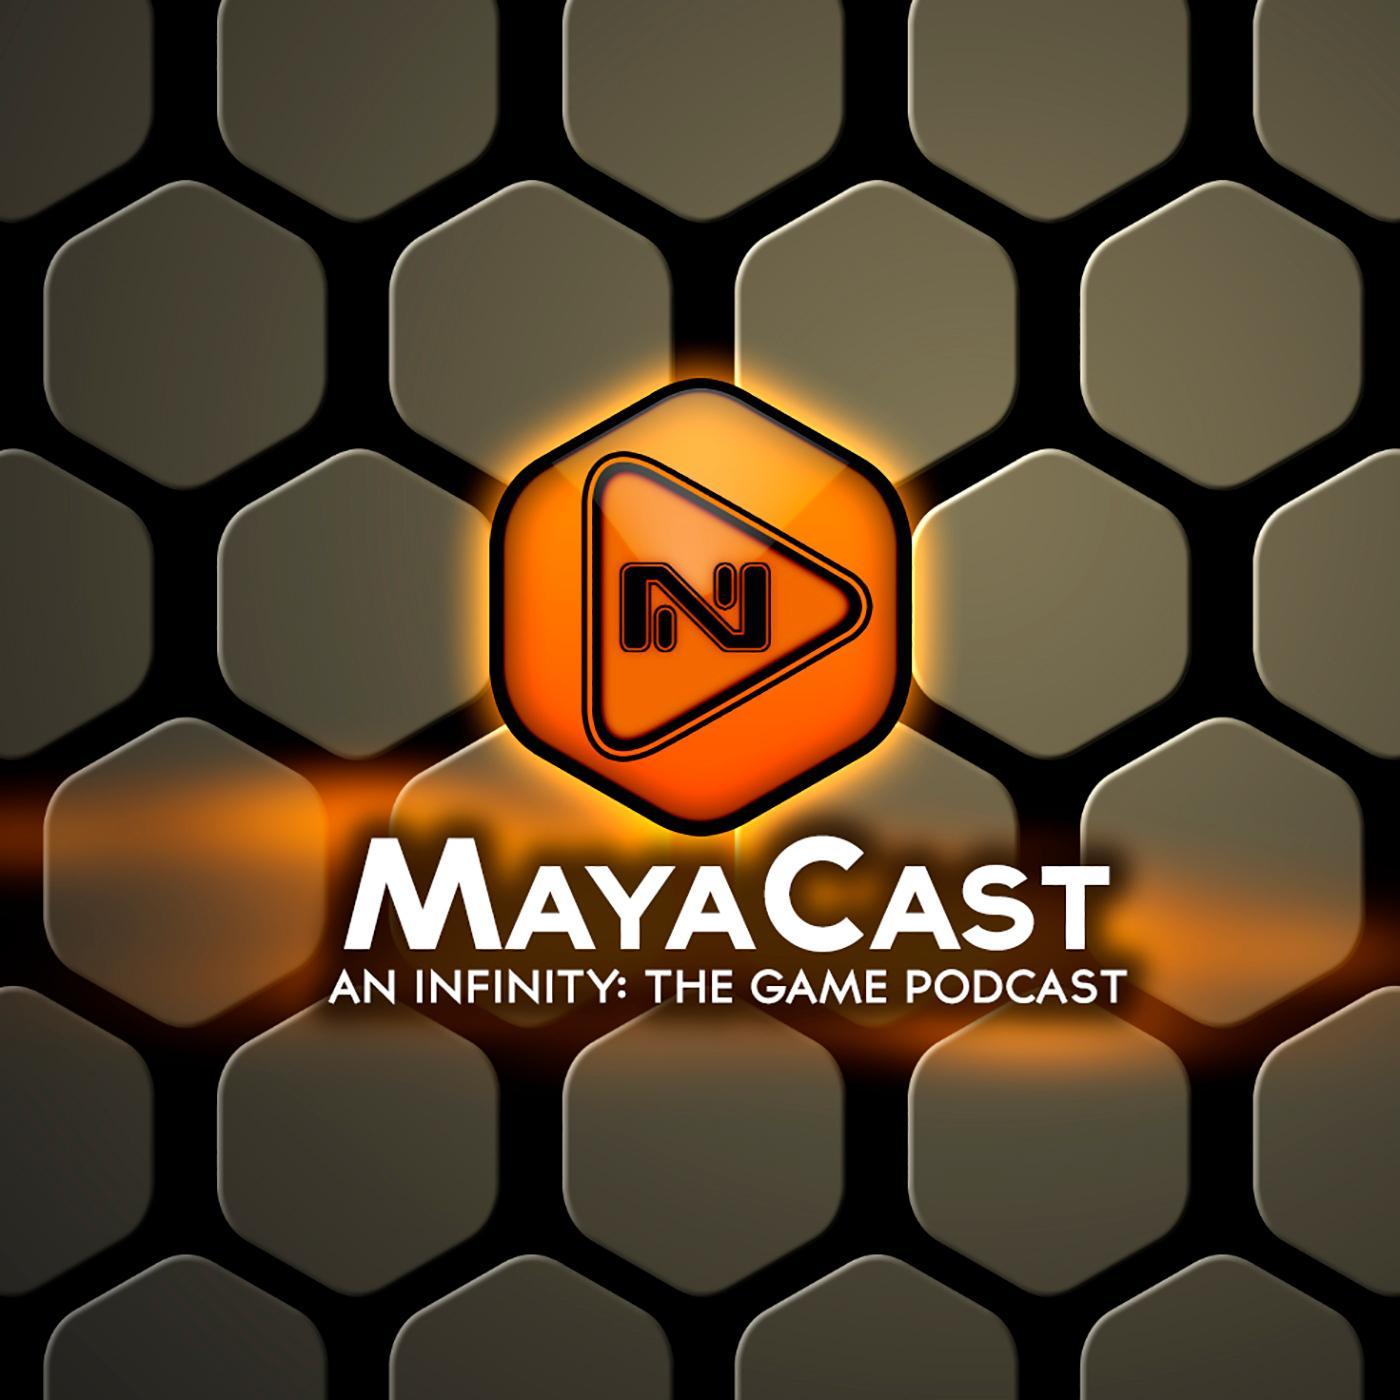 MayaCast Episode 118: It's ALIVE!